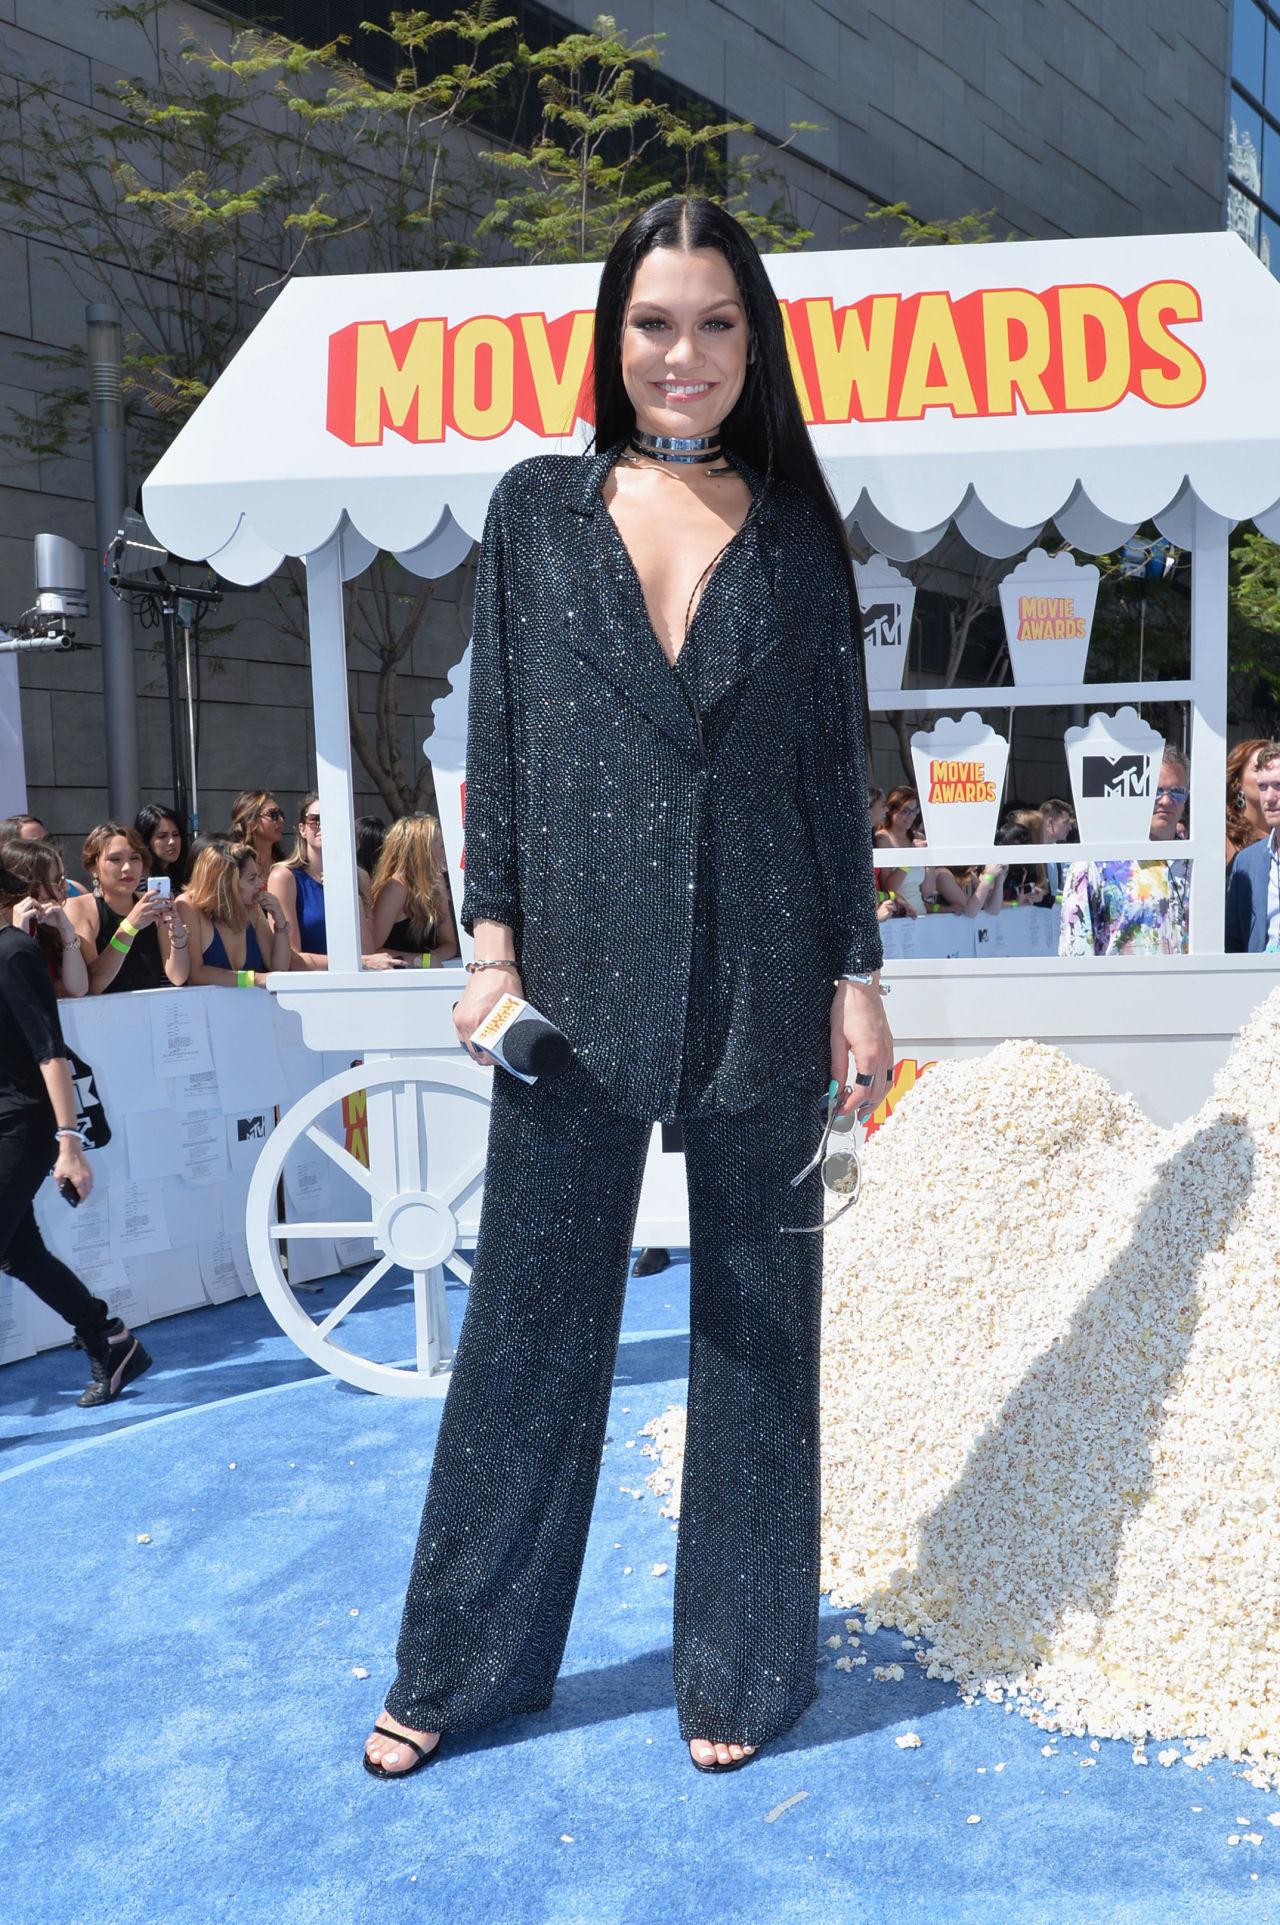 Vanessa Mtv Made Gallery Showbiz Mtv Movie Awards Jessie J